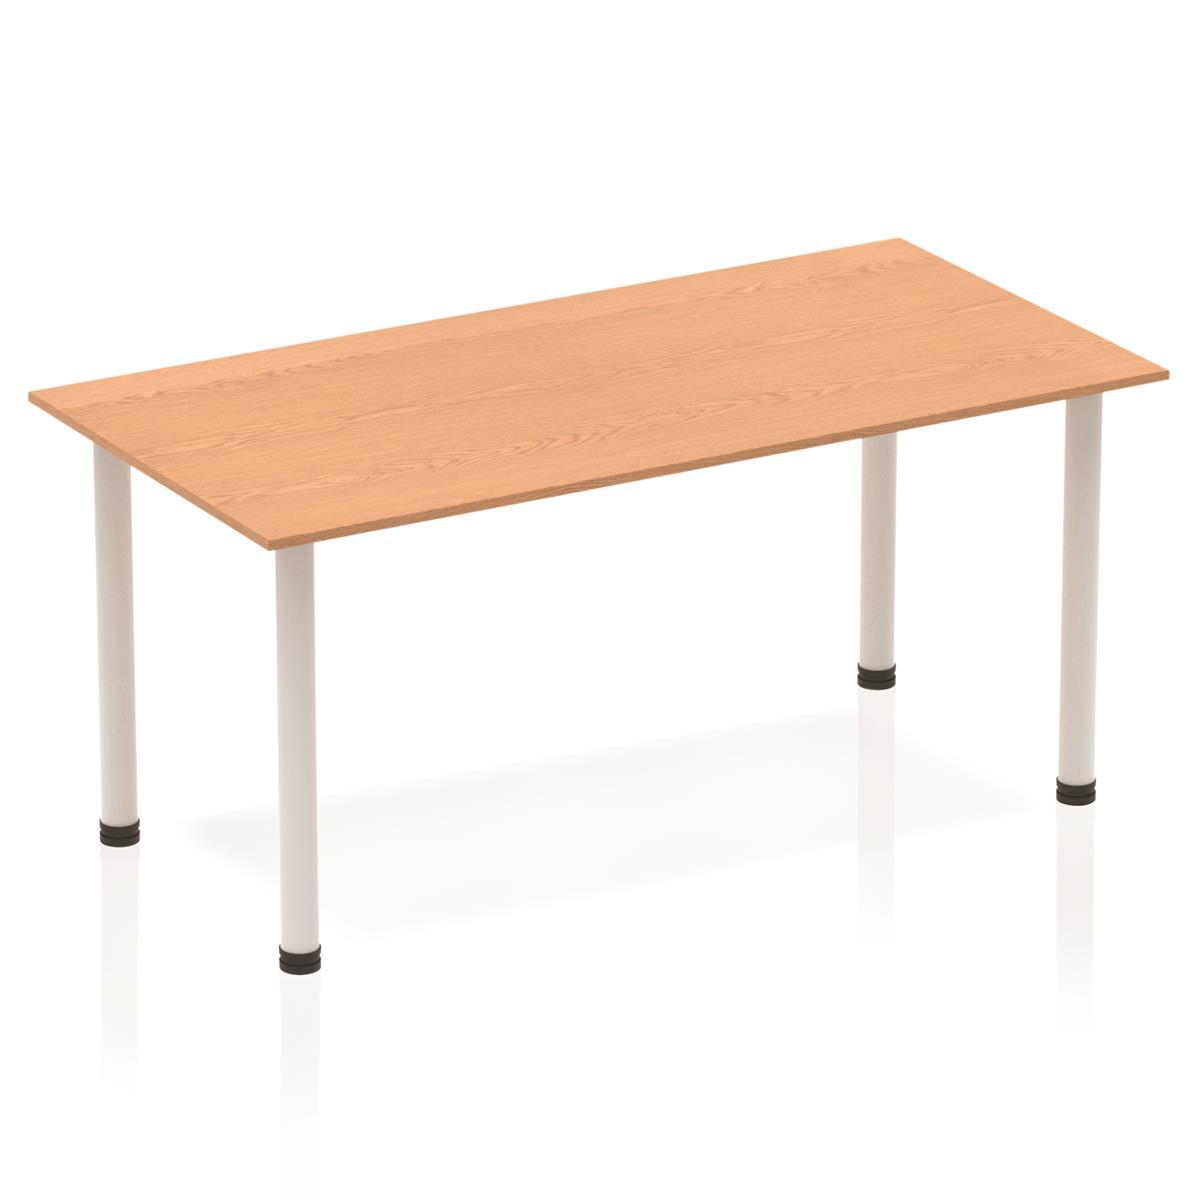 Sonix Rectangular Silver Post Leg Table 1600x800mm Oak Ref BF00180